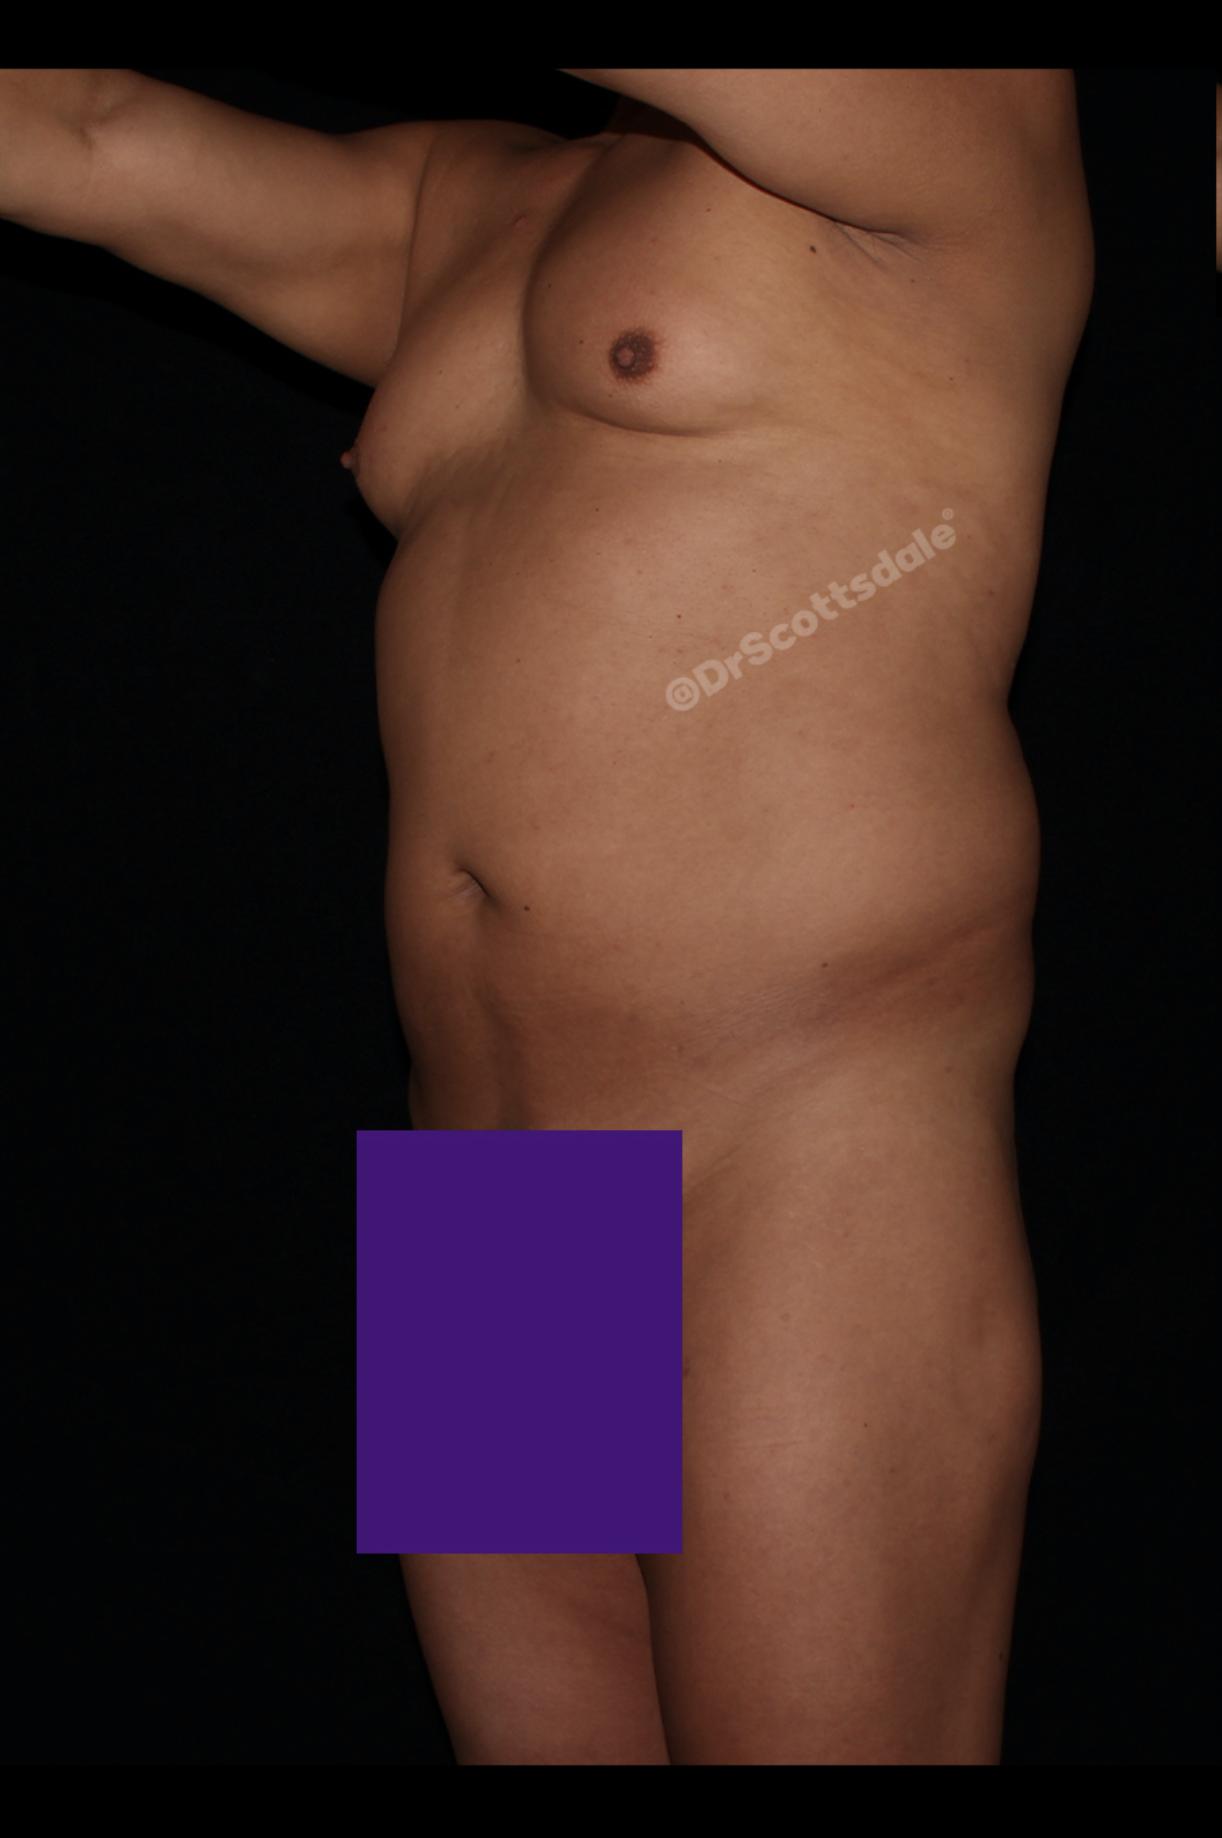 Before Gladiator - Gladiator - Male Body Transformation